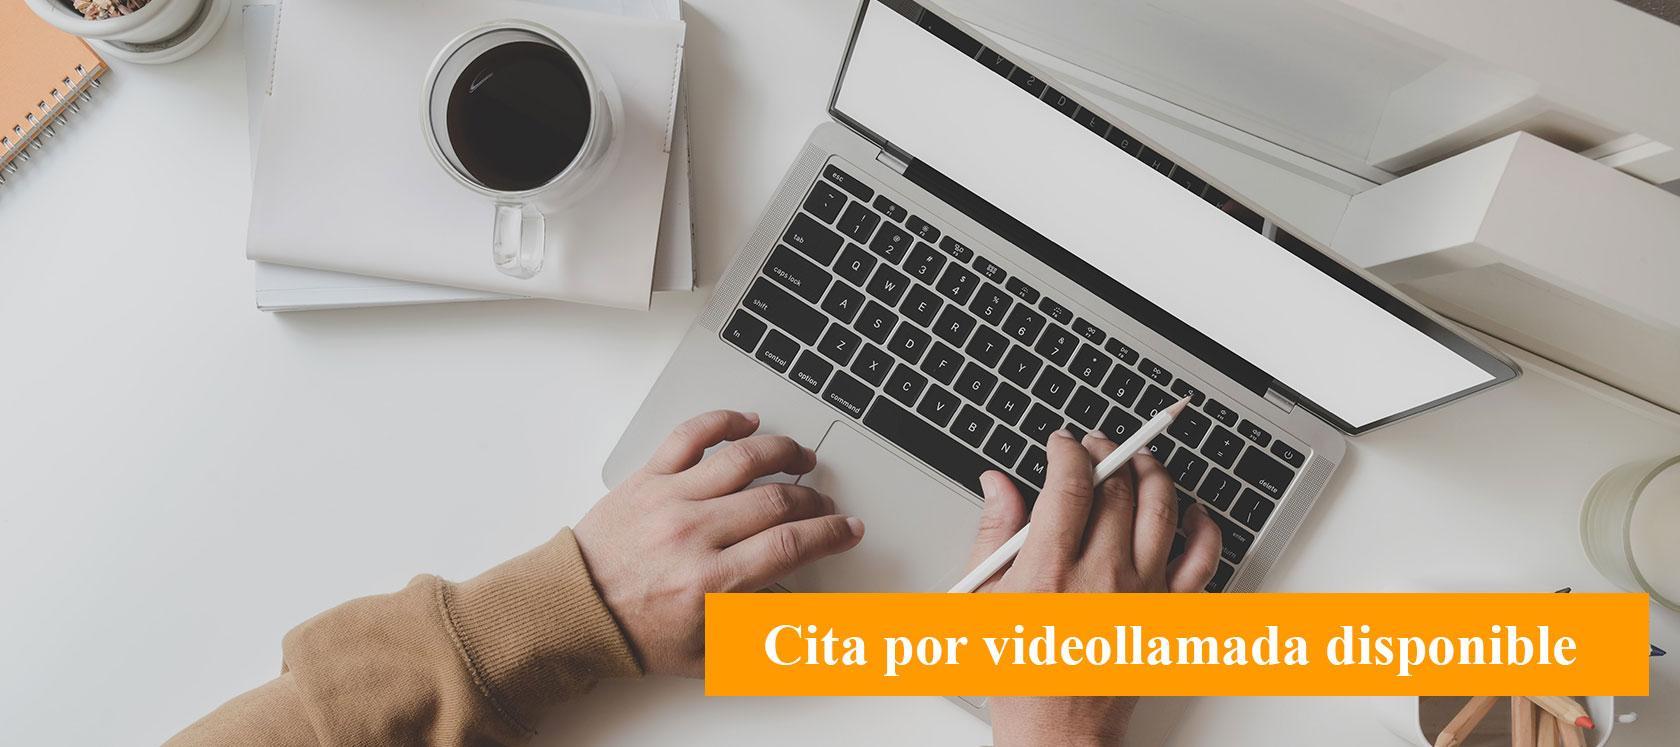 Obra nueva en Sevilla  celere citrus